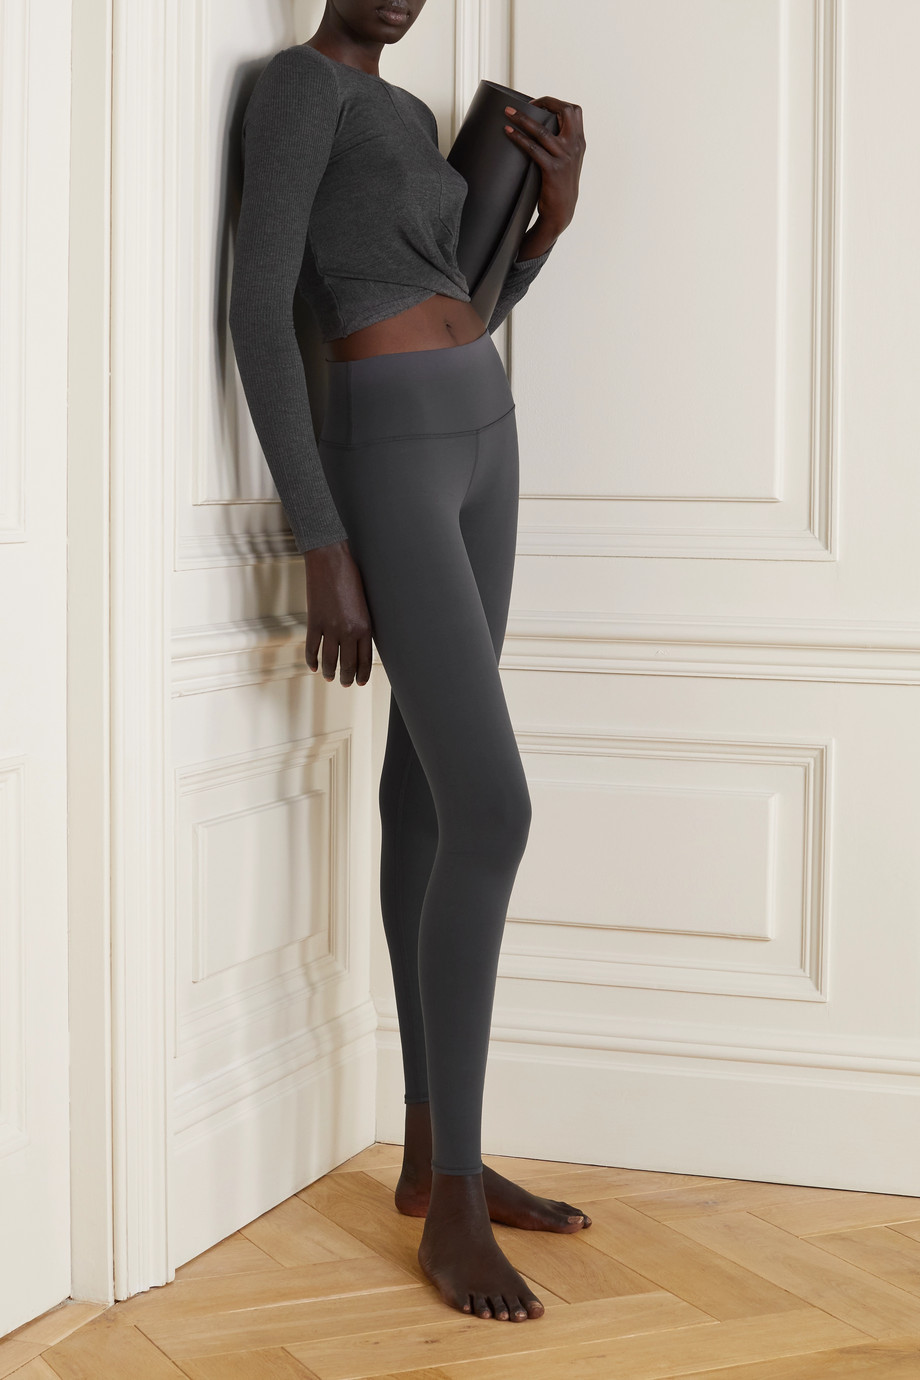 Alo Yoga Airbrush stretch leggings